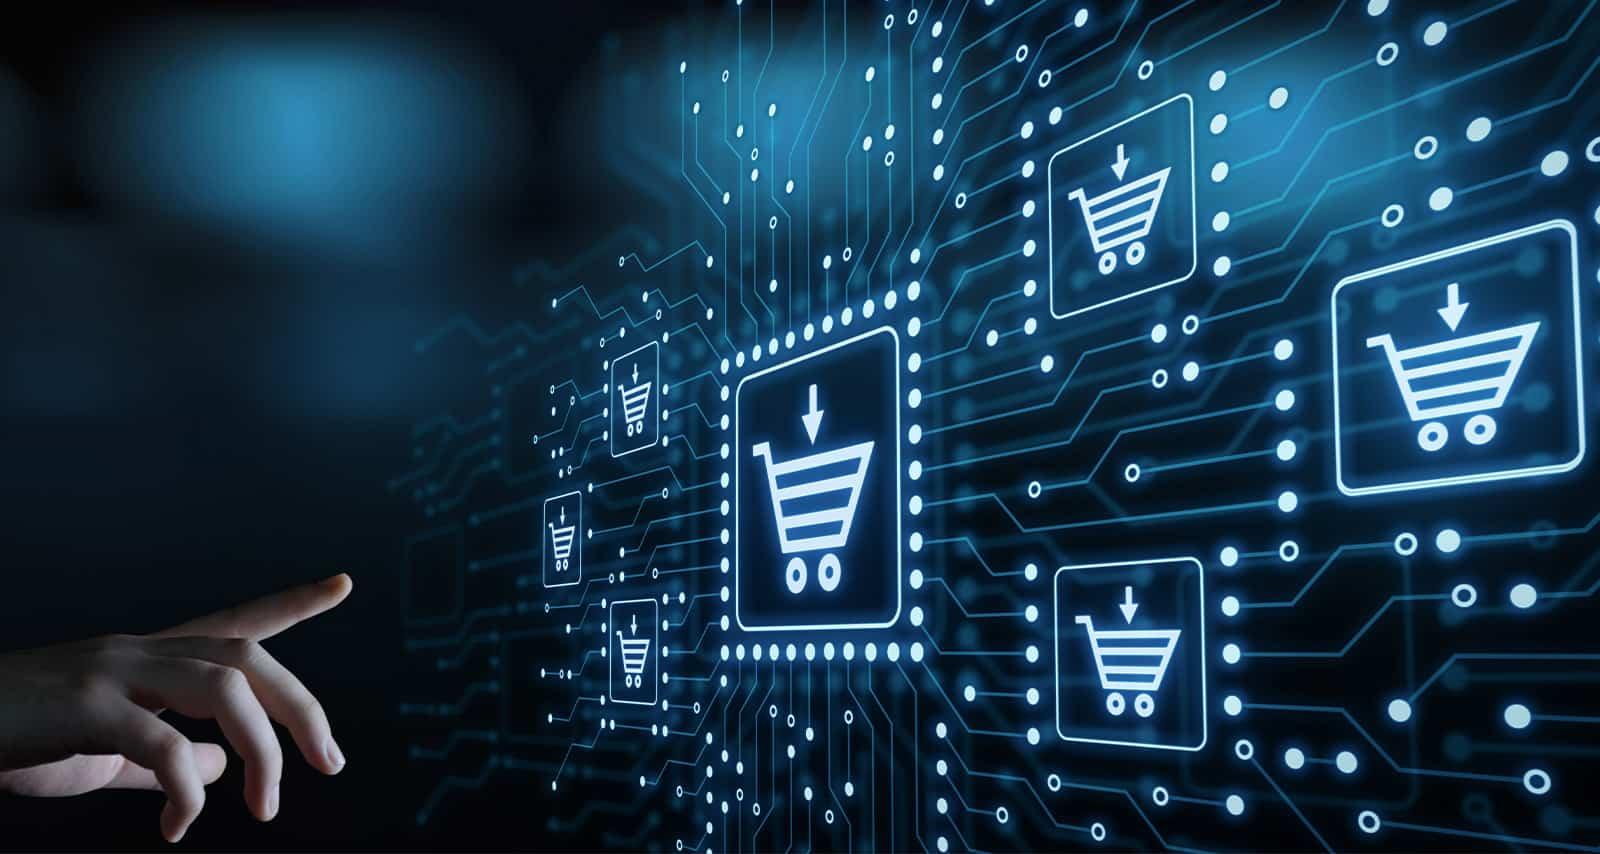 E-commerce site, sales, Digital communication, B2C vendors, B2B businesses McKinsey